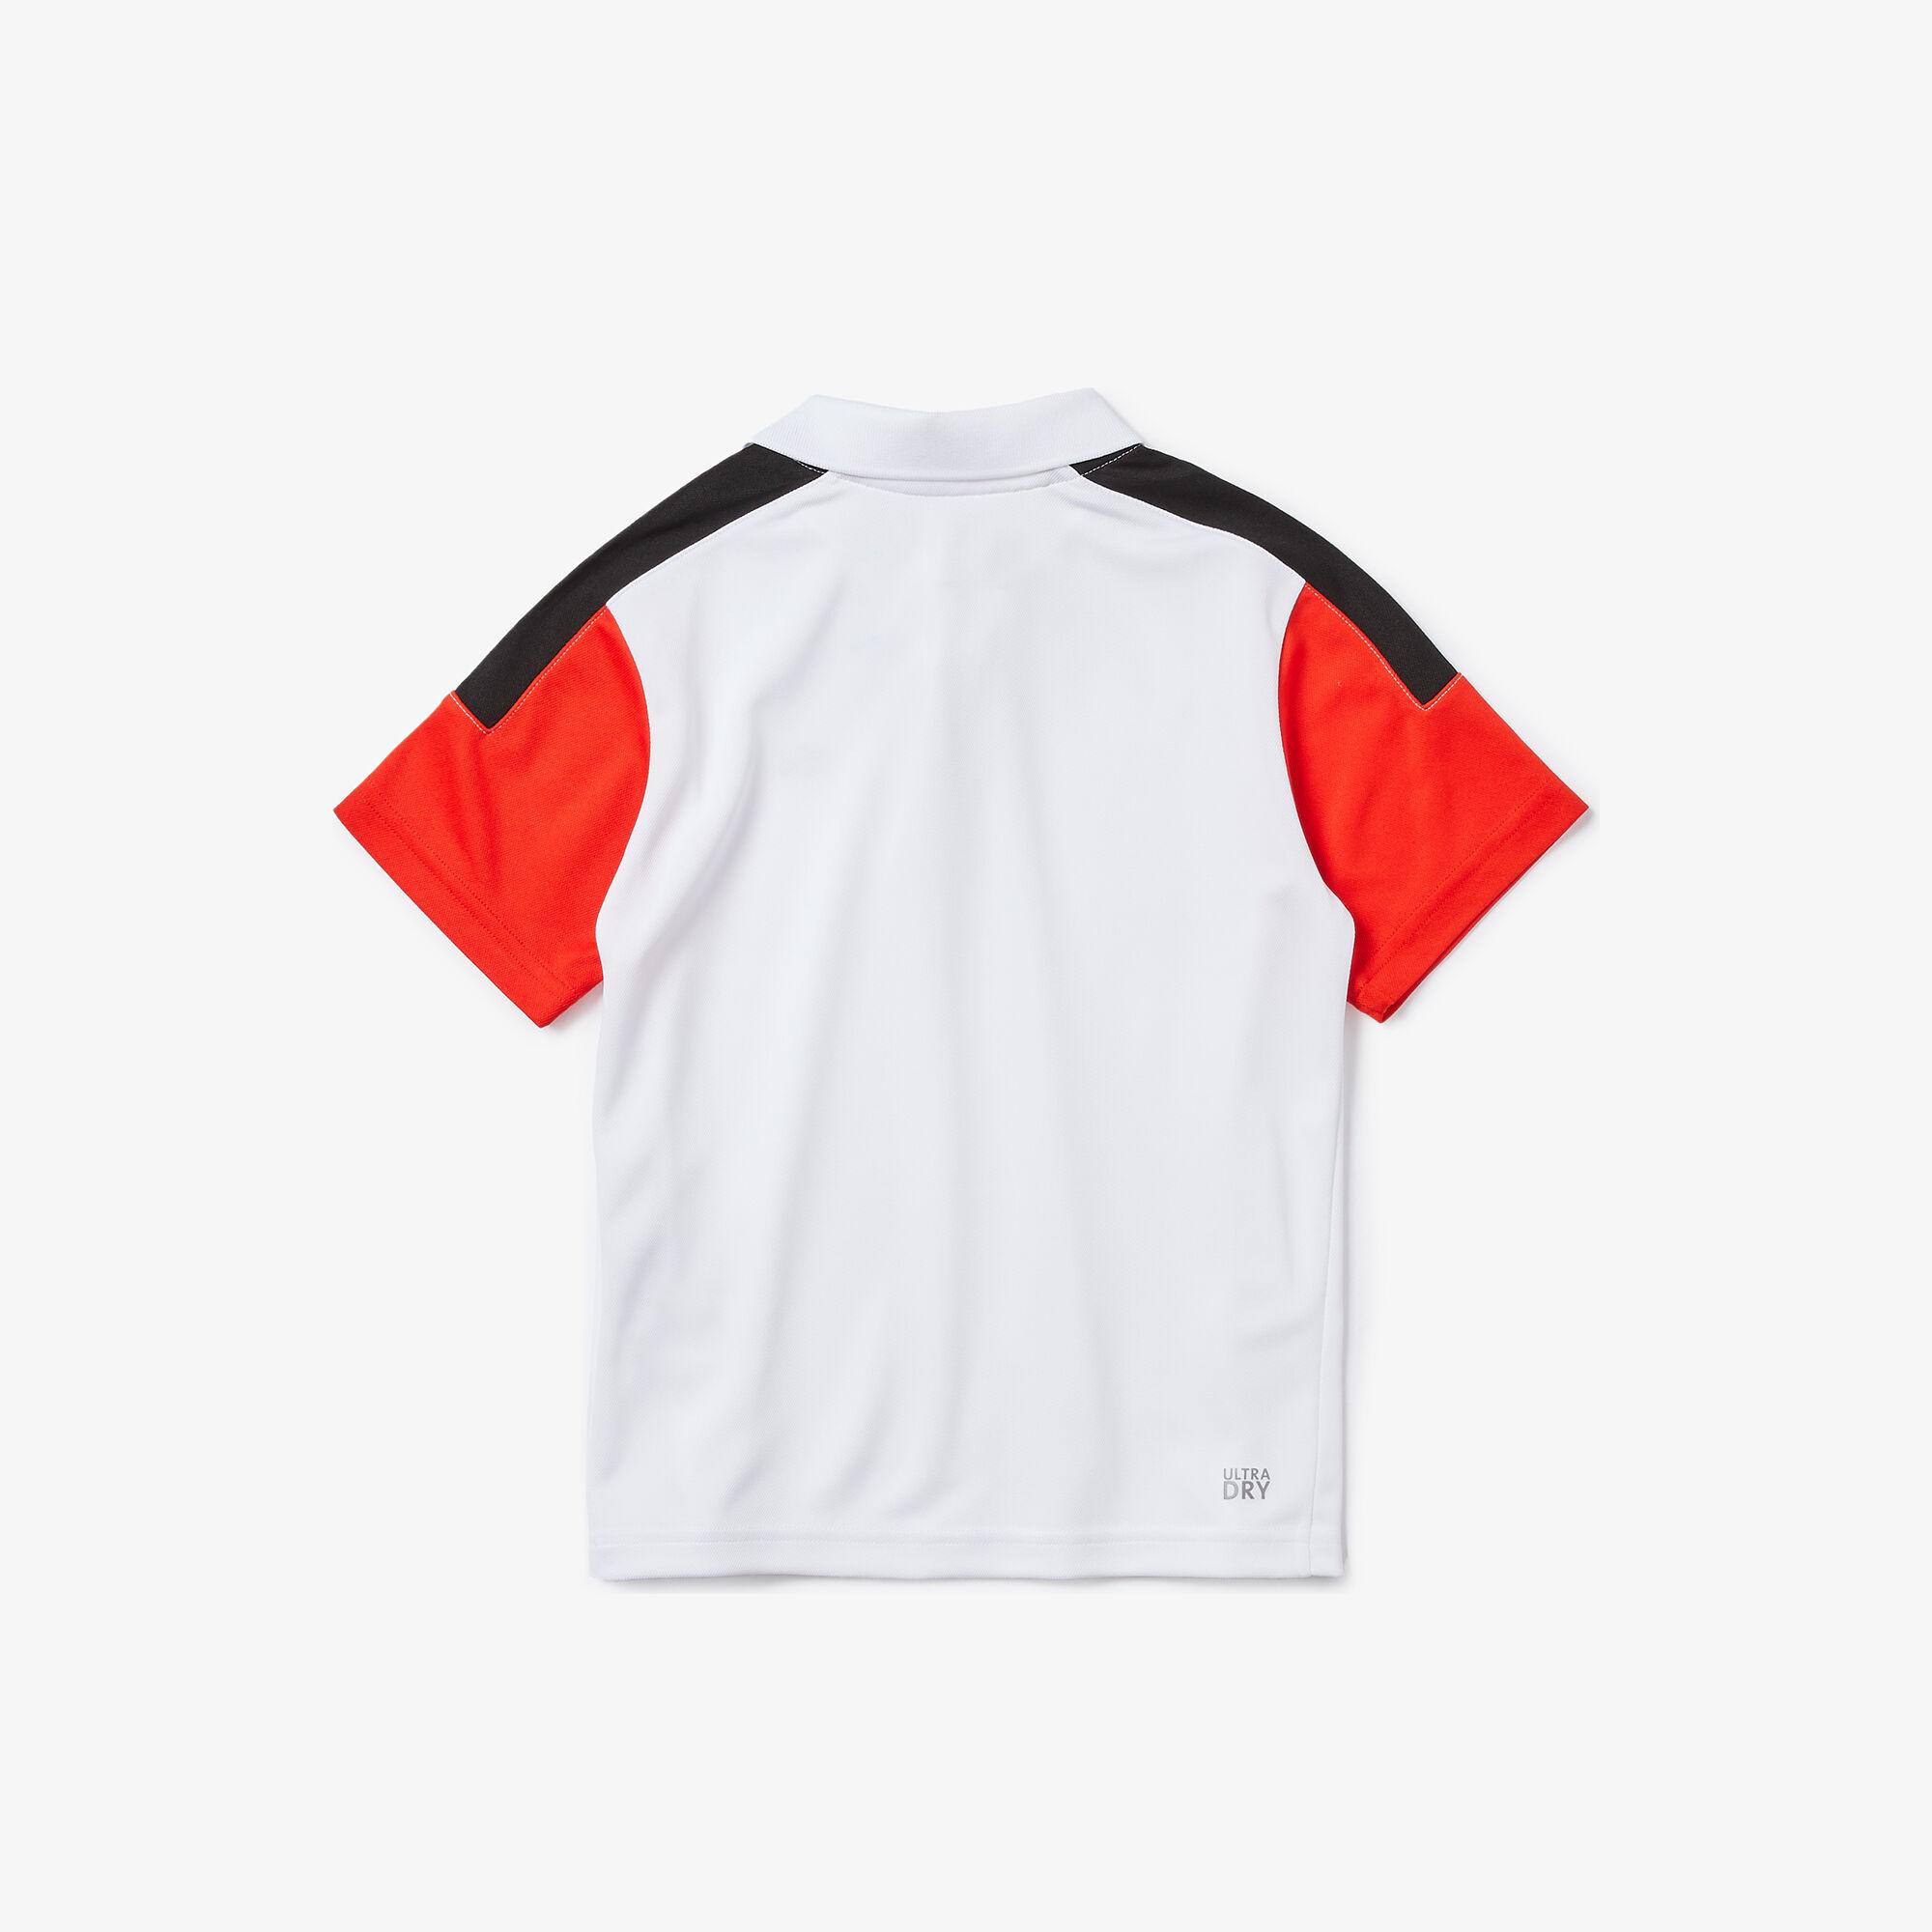 Boys' Lacoste SPORT Breathable, Run-Resistant Tennis Polo Shirt